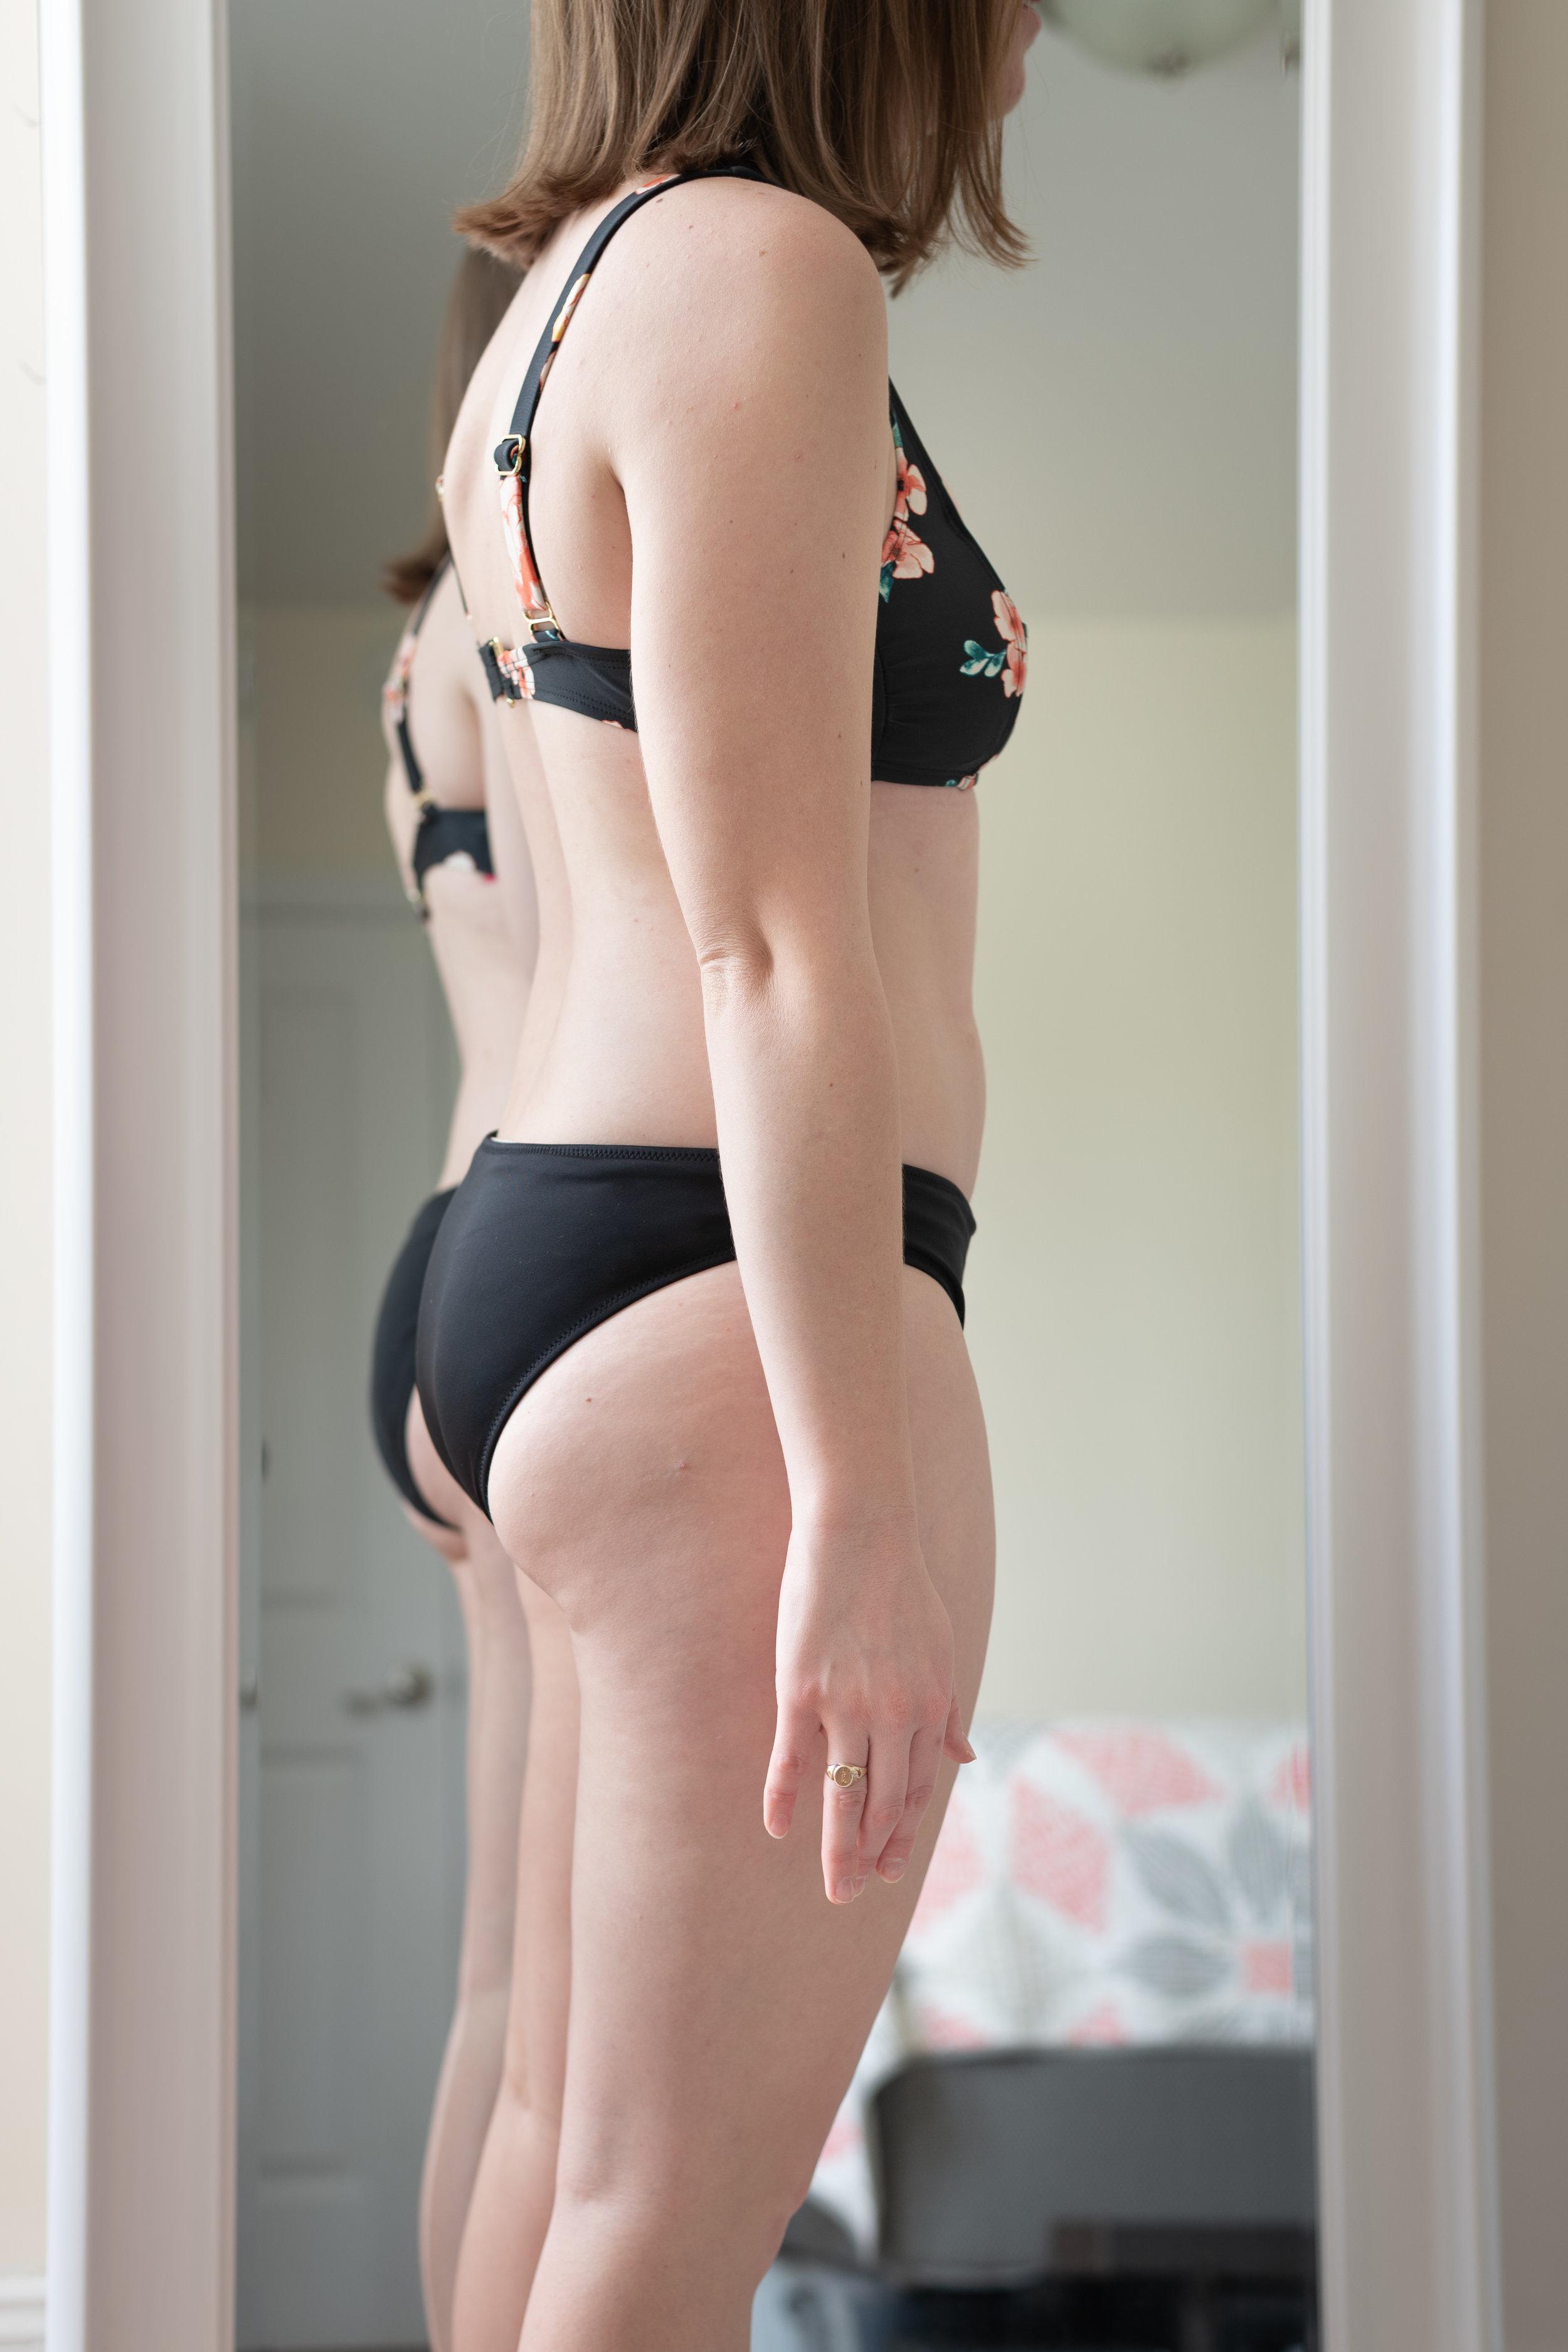 Xhilaration Square Neck Bralette Bikini Top and Shade & Shore Beach Hipster Bikini Bottom